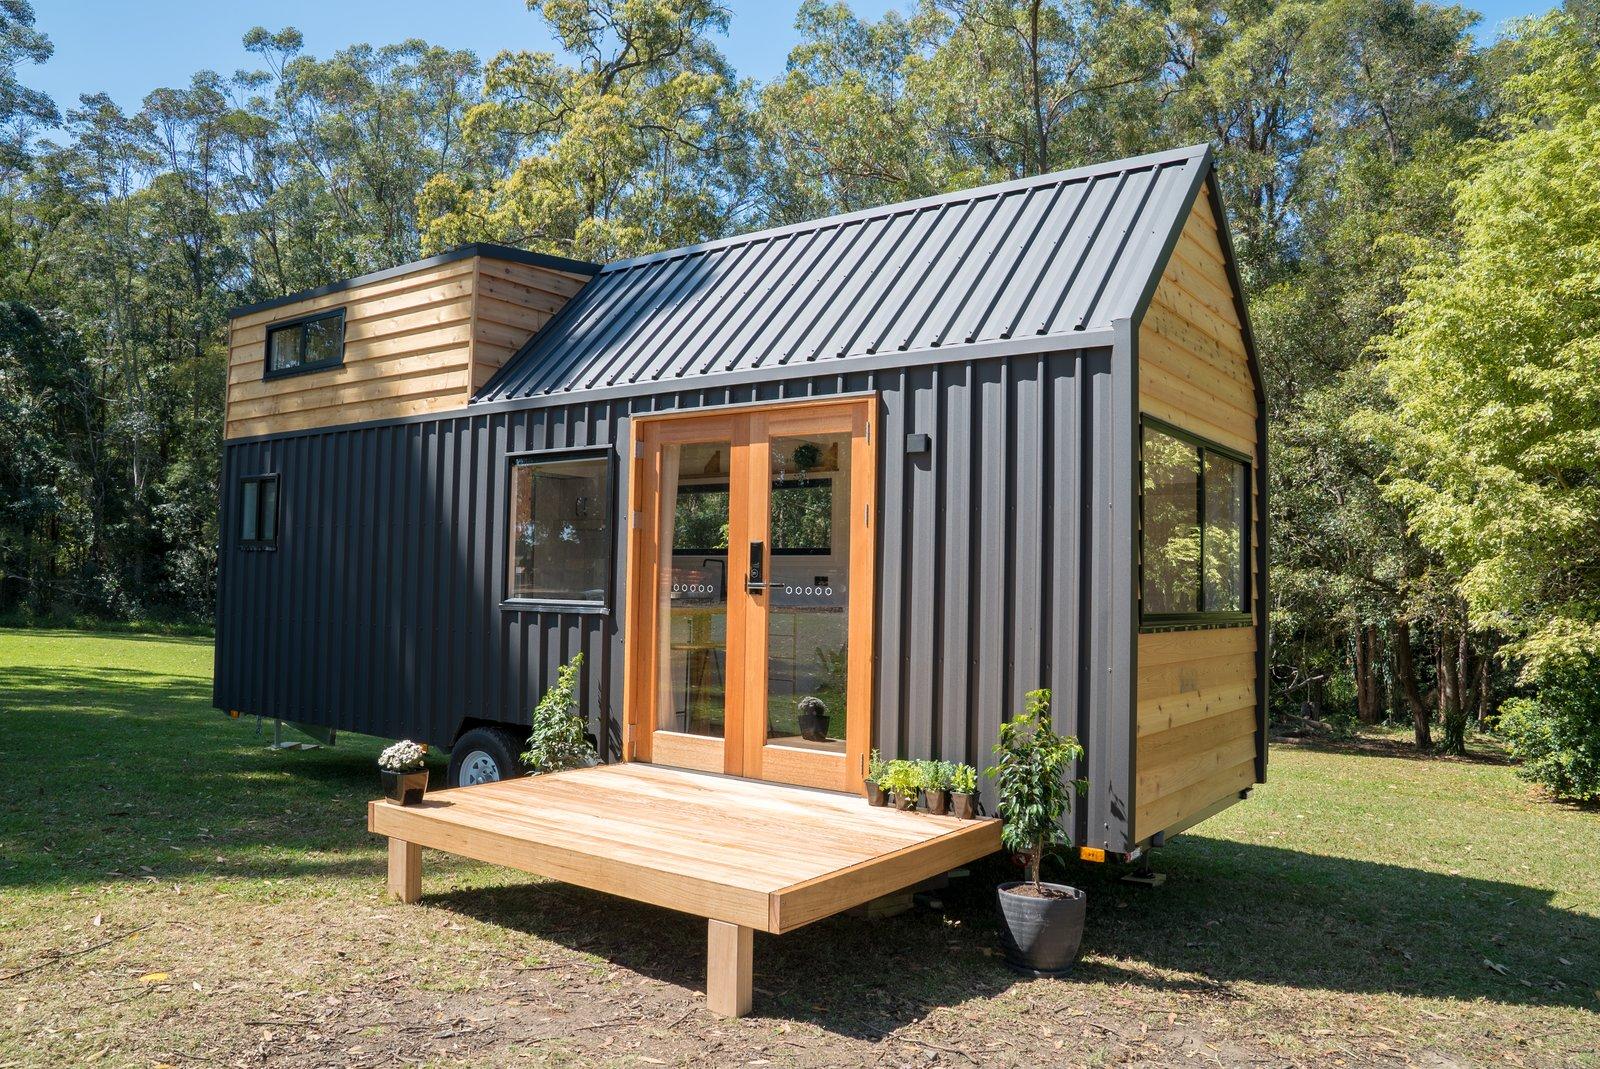 Sojourner tiny house exterior